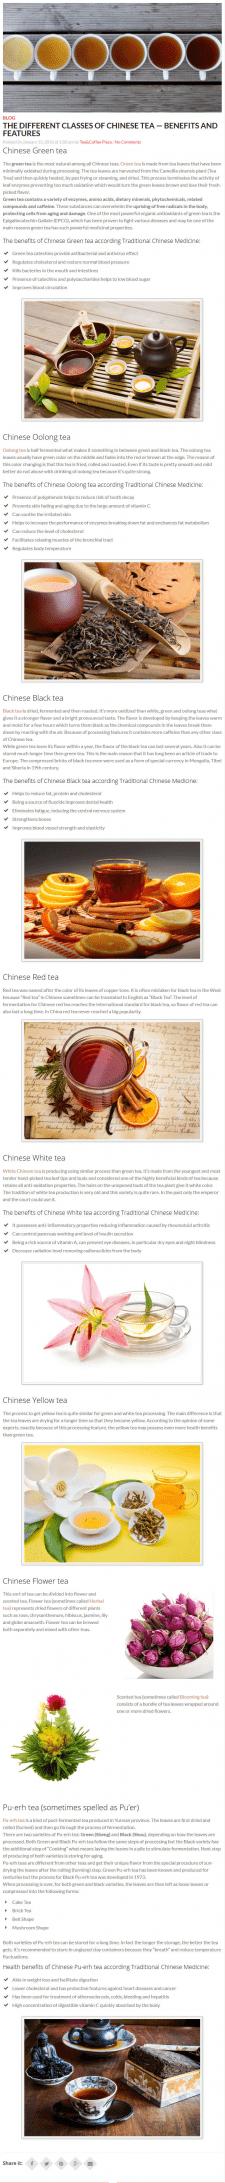 Статья на англ. яз. о видах чая